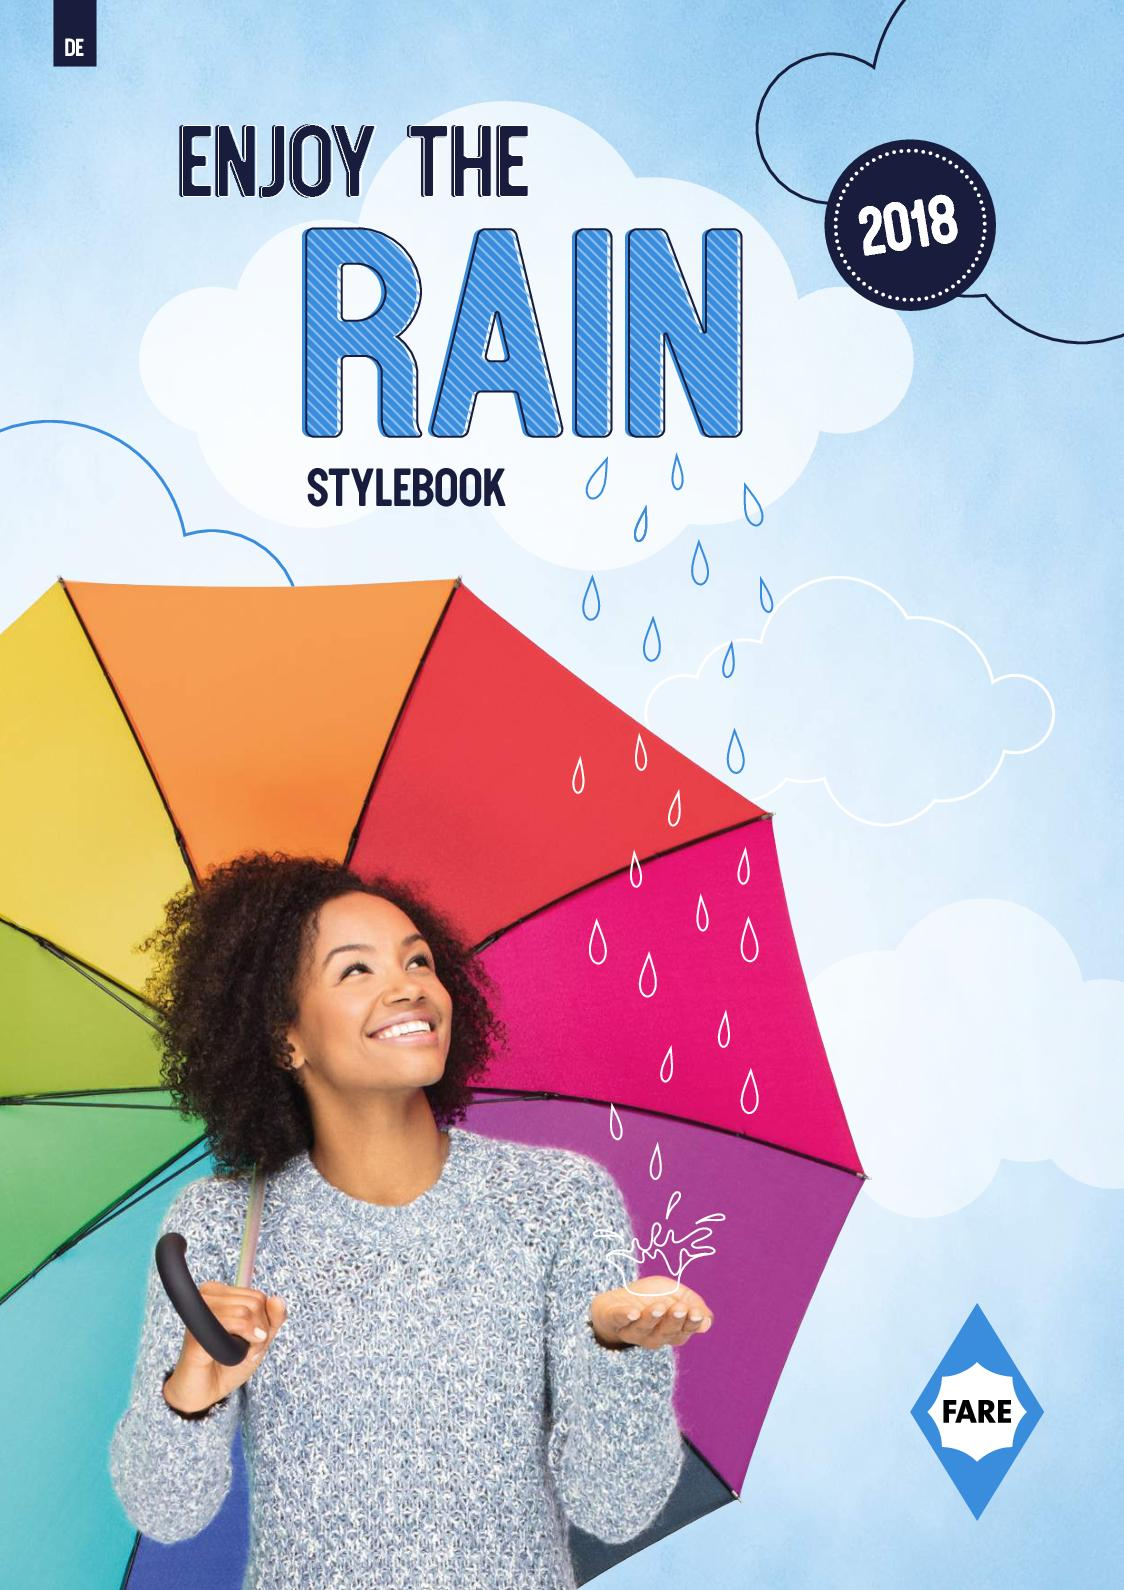 Regenschirm Safebrella-Led Mini Umbrella von Fare # regenschutz regen schirm